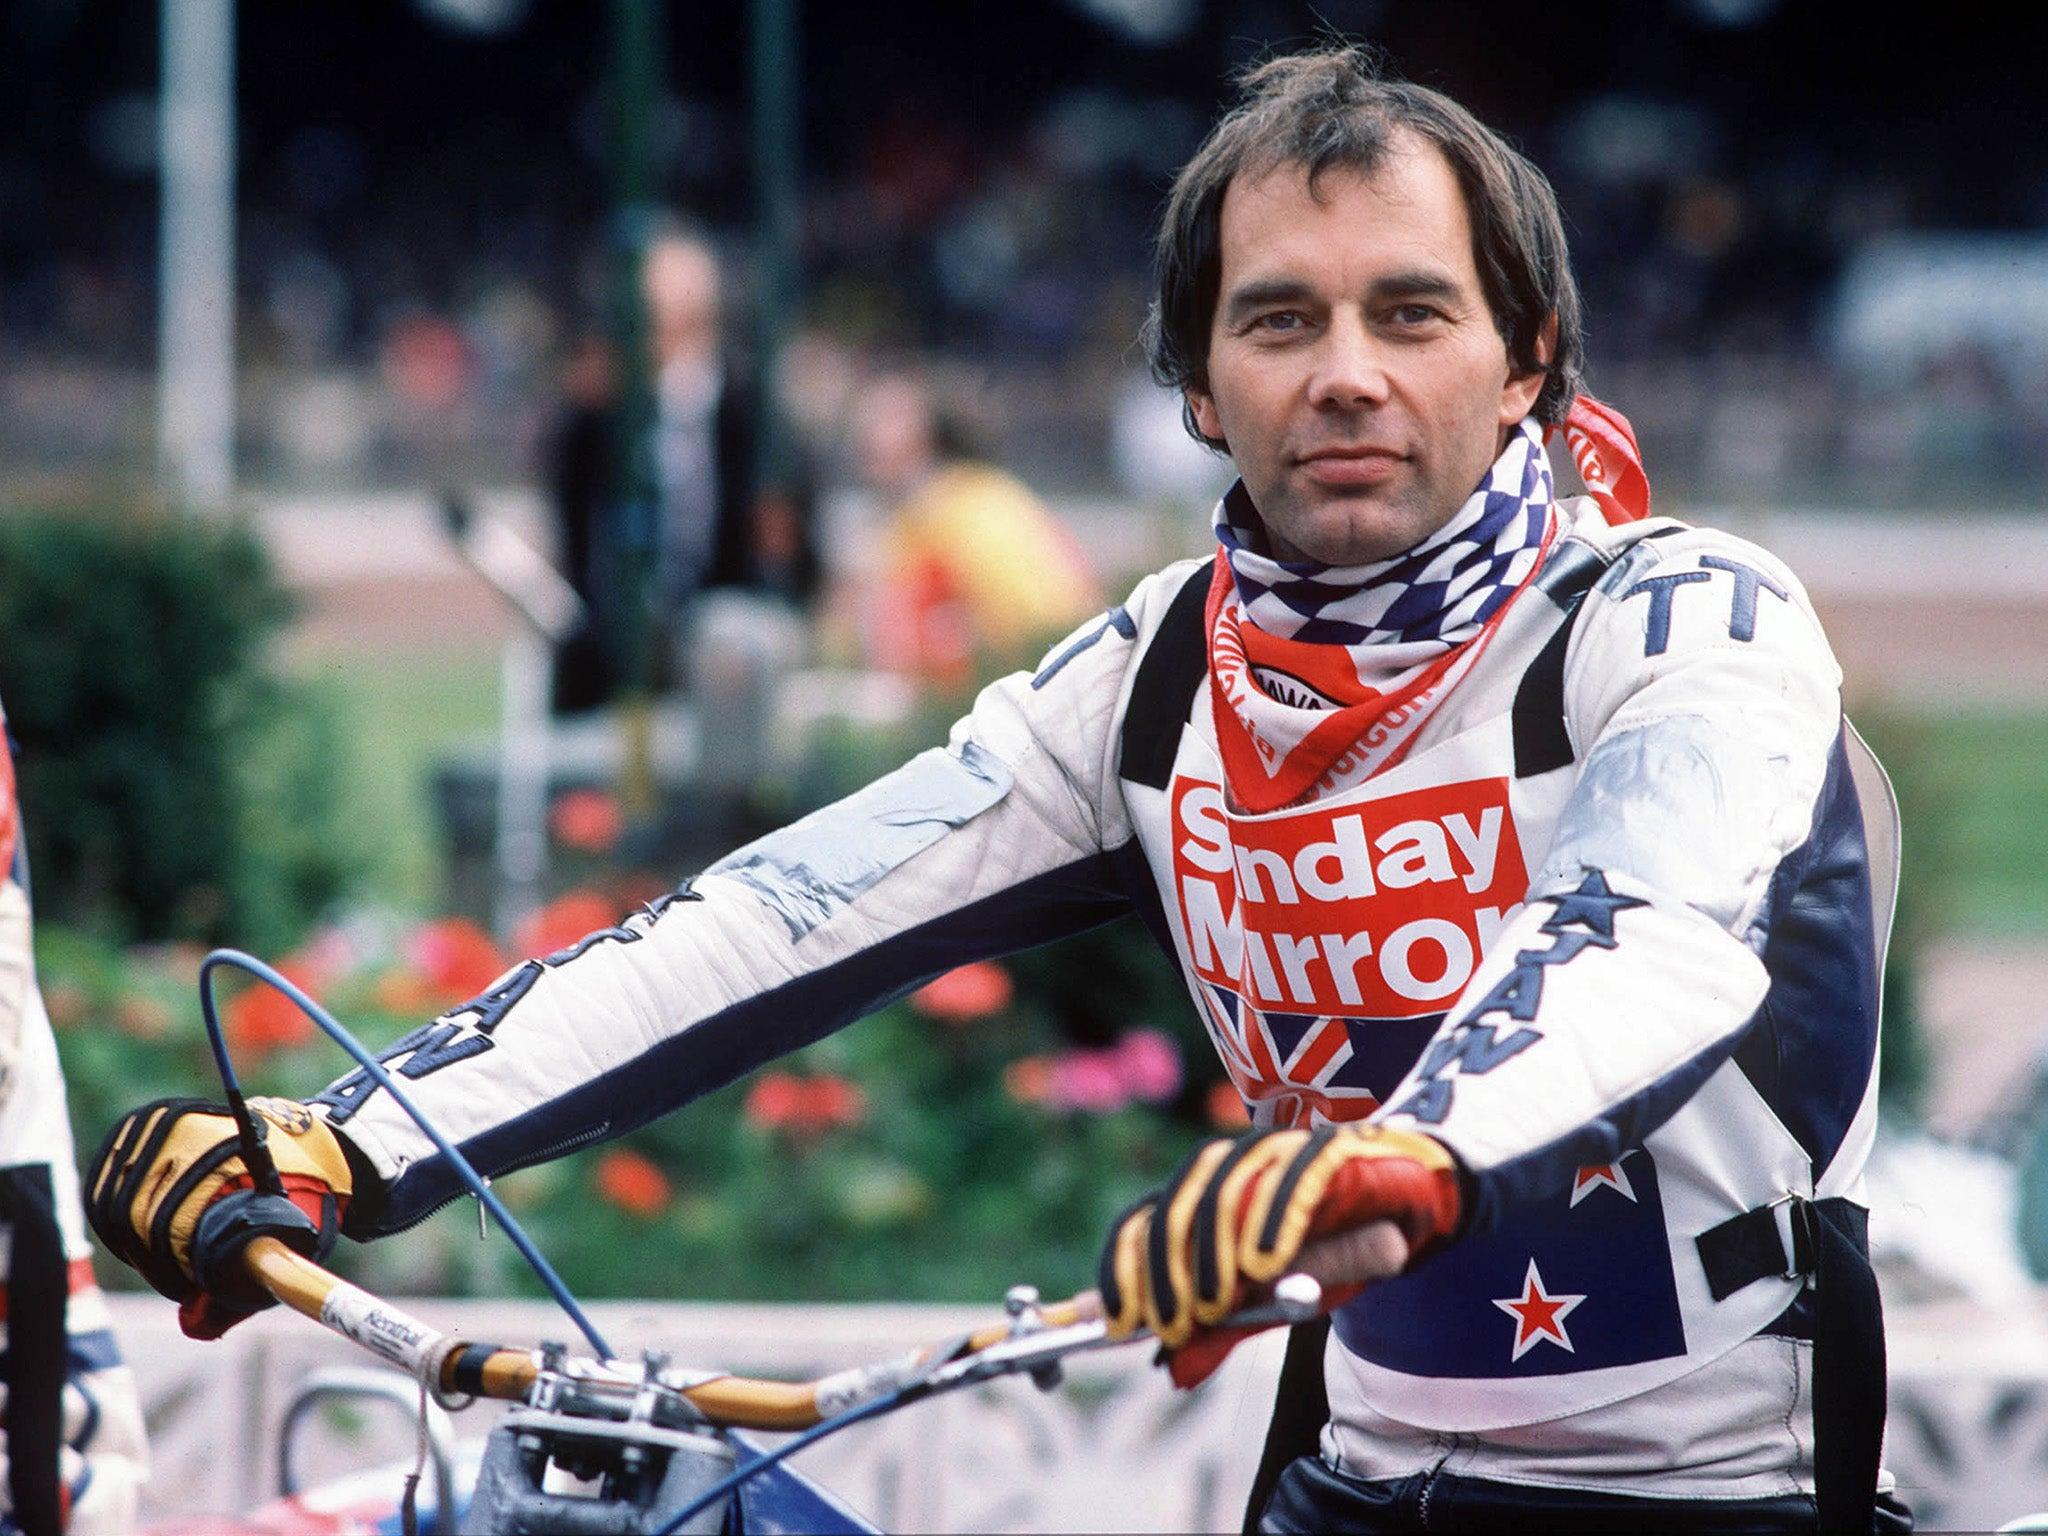 Ivan Mauger New Zealand Speedway Legend Who Won Six World Titles The Independent